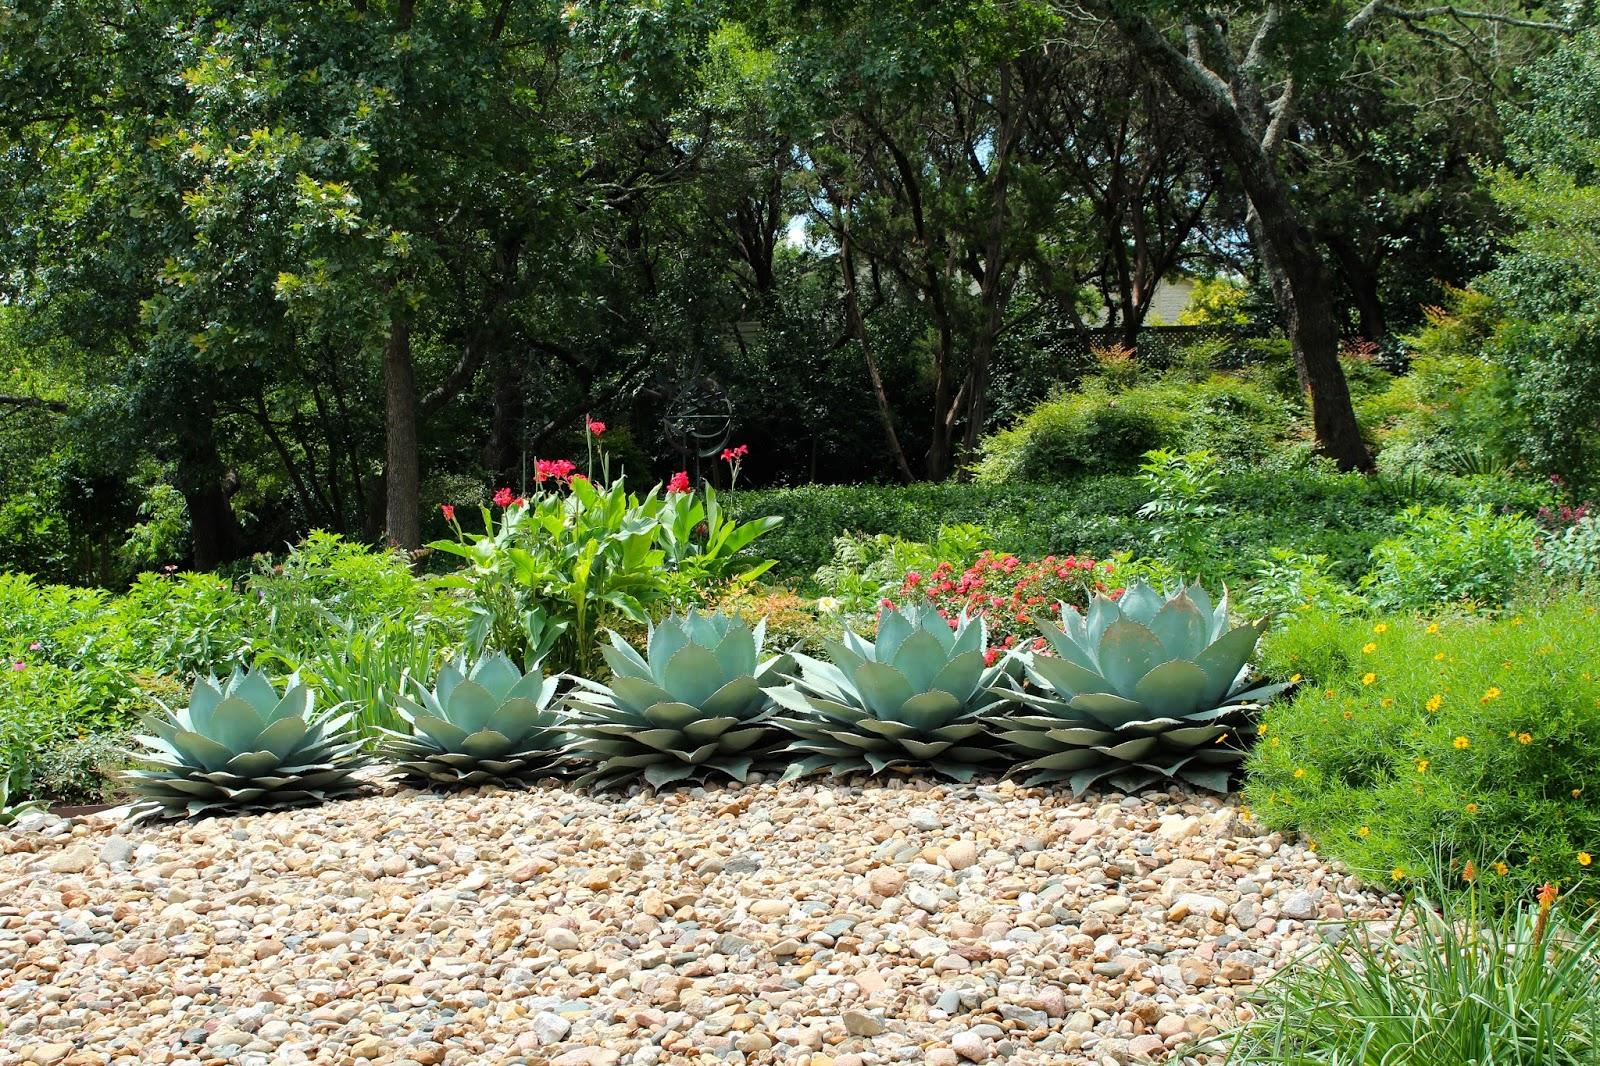 Sharing nature 39 s garden delightful garden tour on a for Sloped rock garden designs